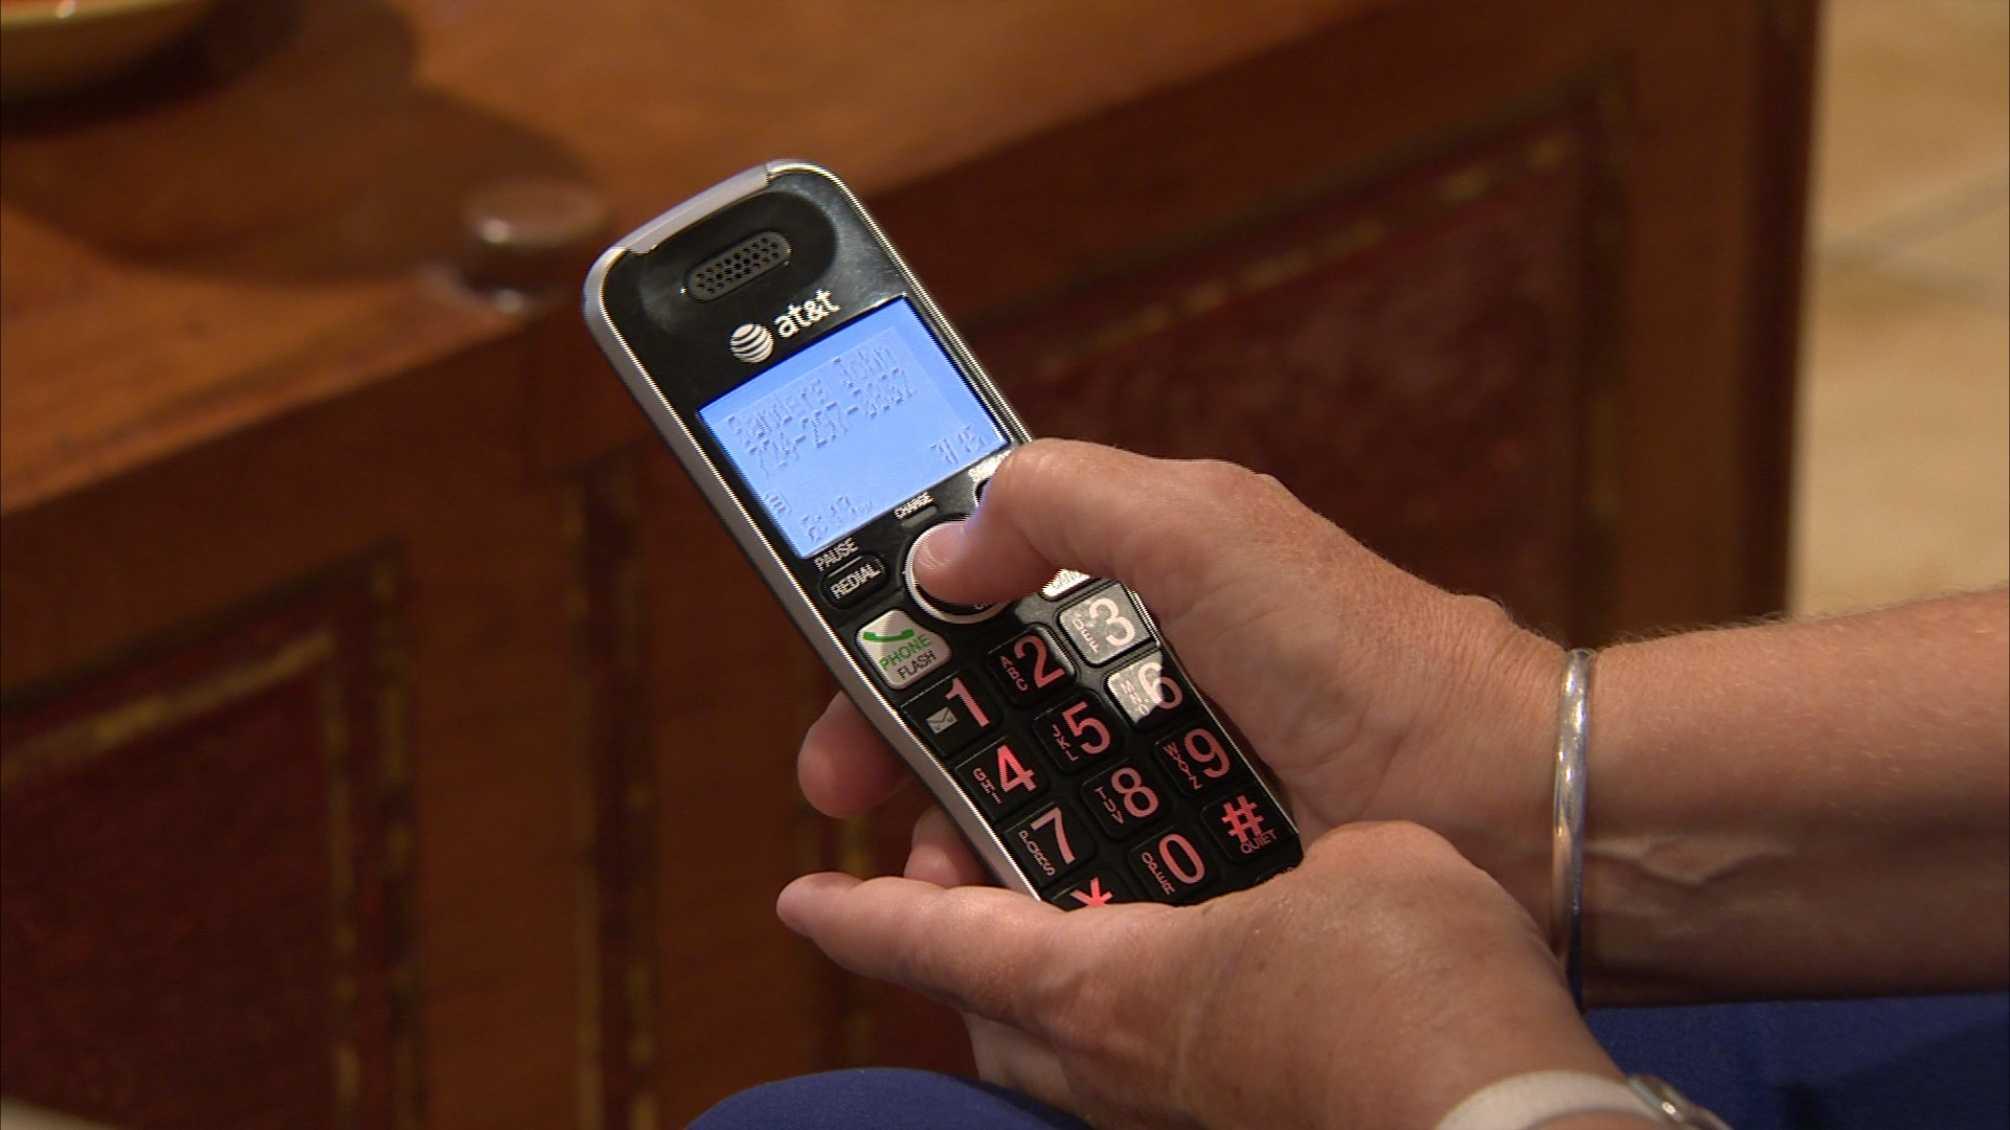 img-phone spoofing